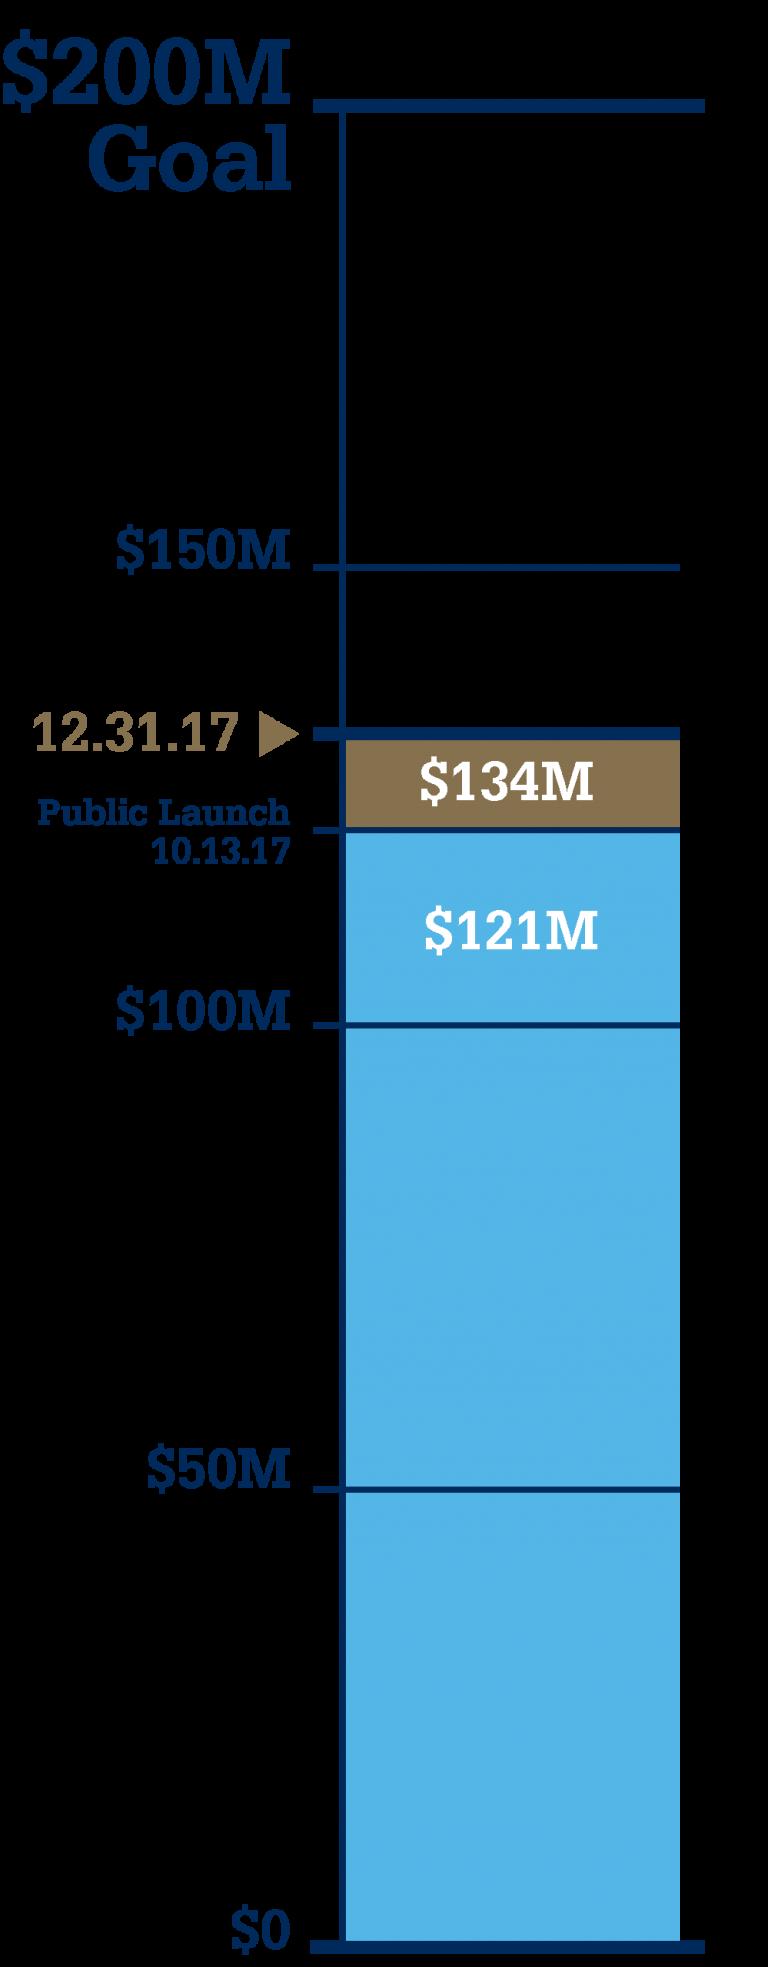 Campaign progress meter showing $134M progress toward $200M goal